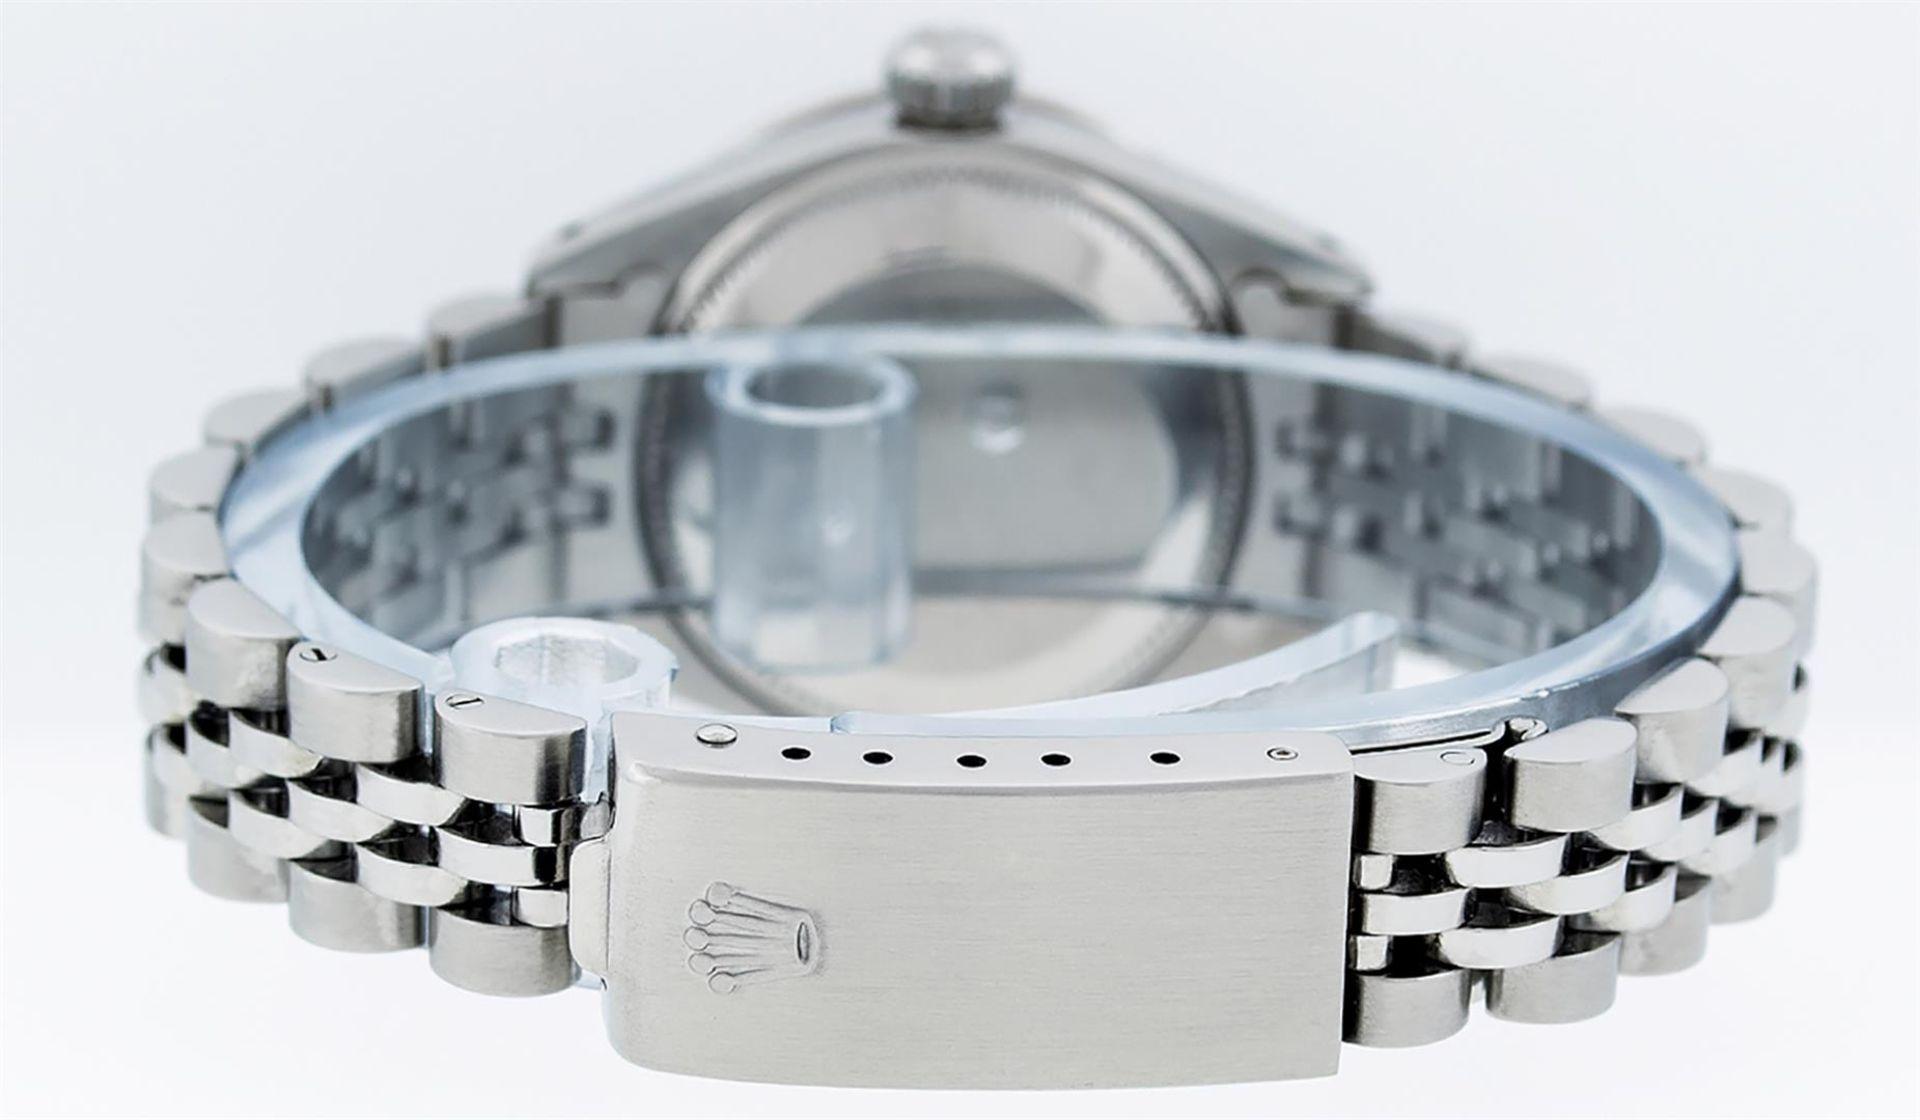 Rolex Ladies Stainless Steel MOP Diamond & Ruby 26MM Datejust Wristwatch - Image 5 of 9